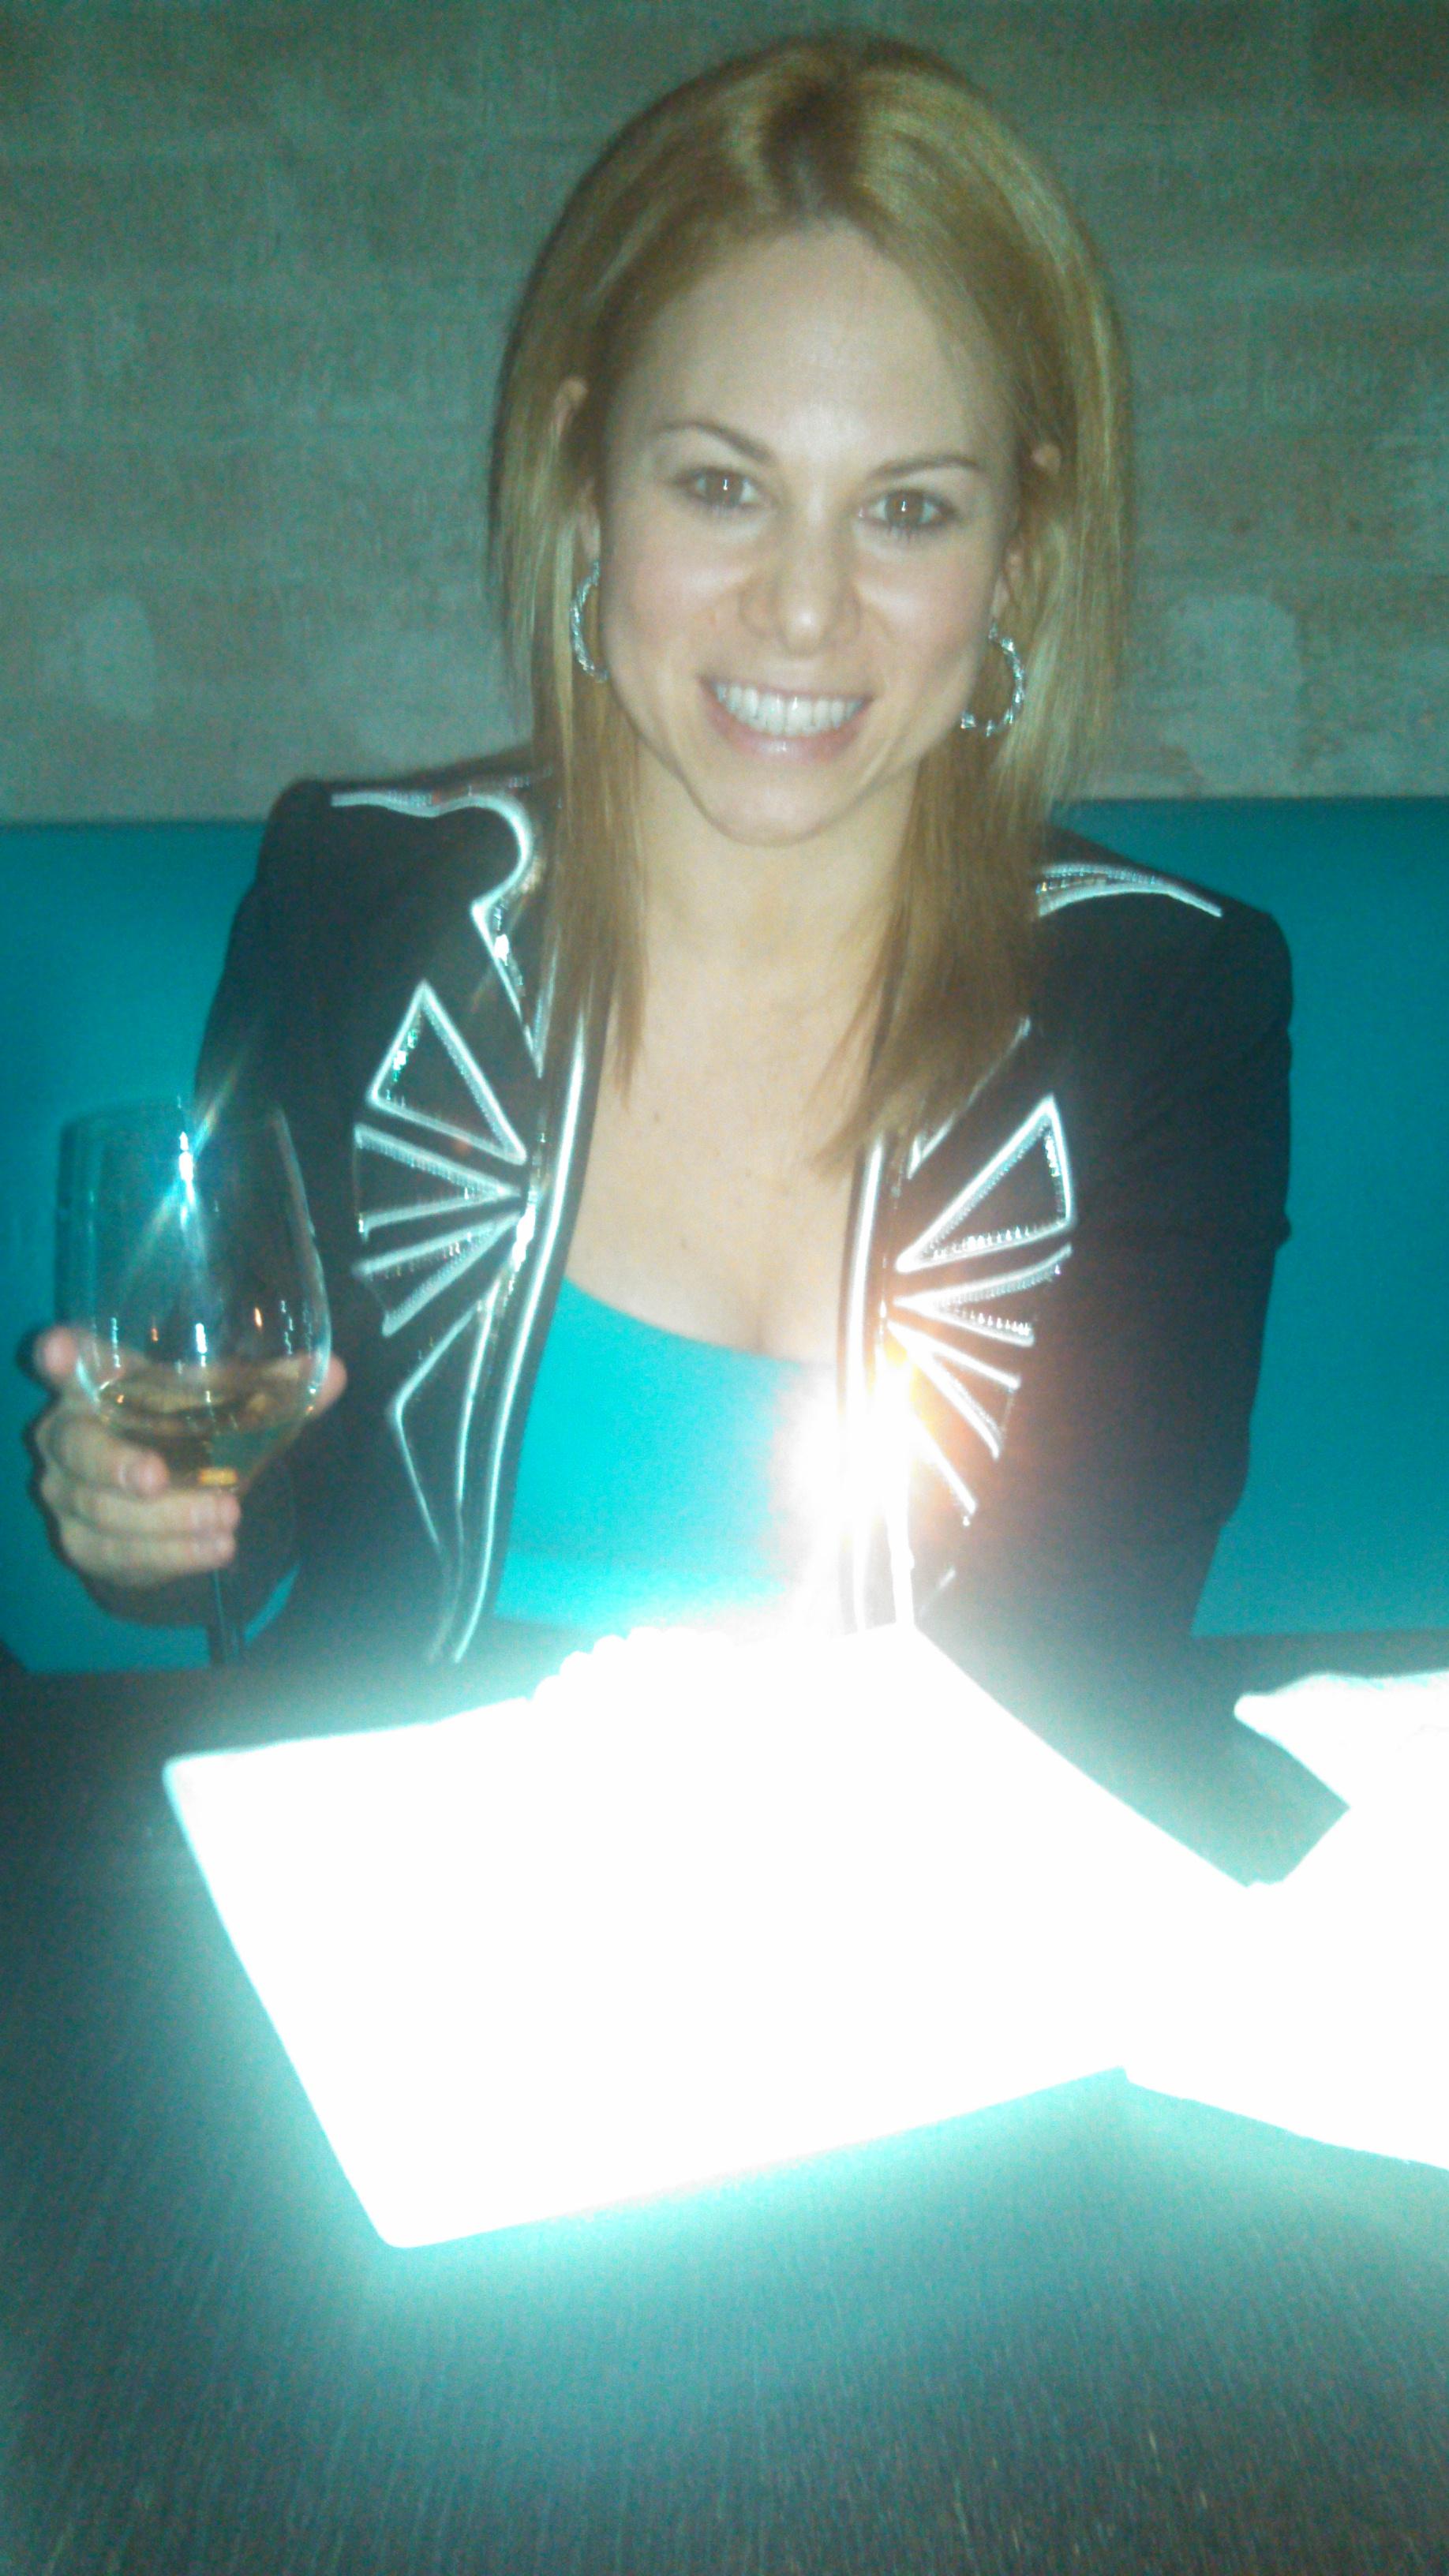 My perfect birthday celebration evening with my boyfriend at my favourite restaurant Buddakan